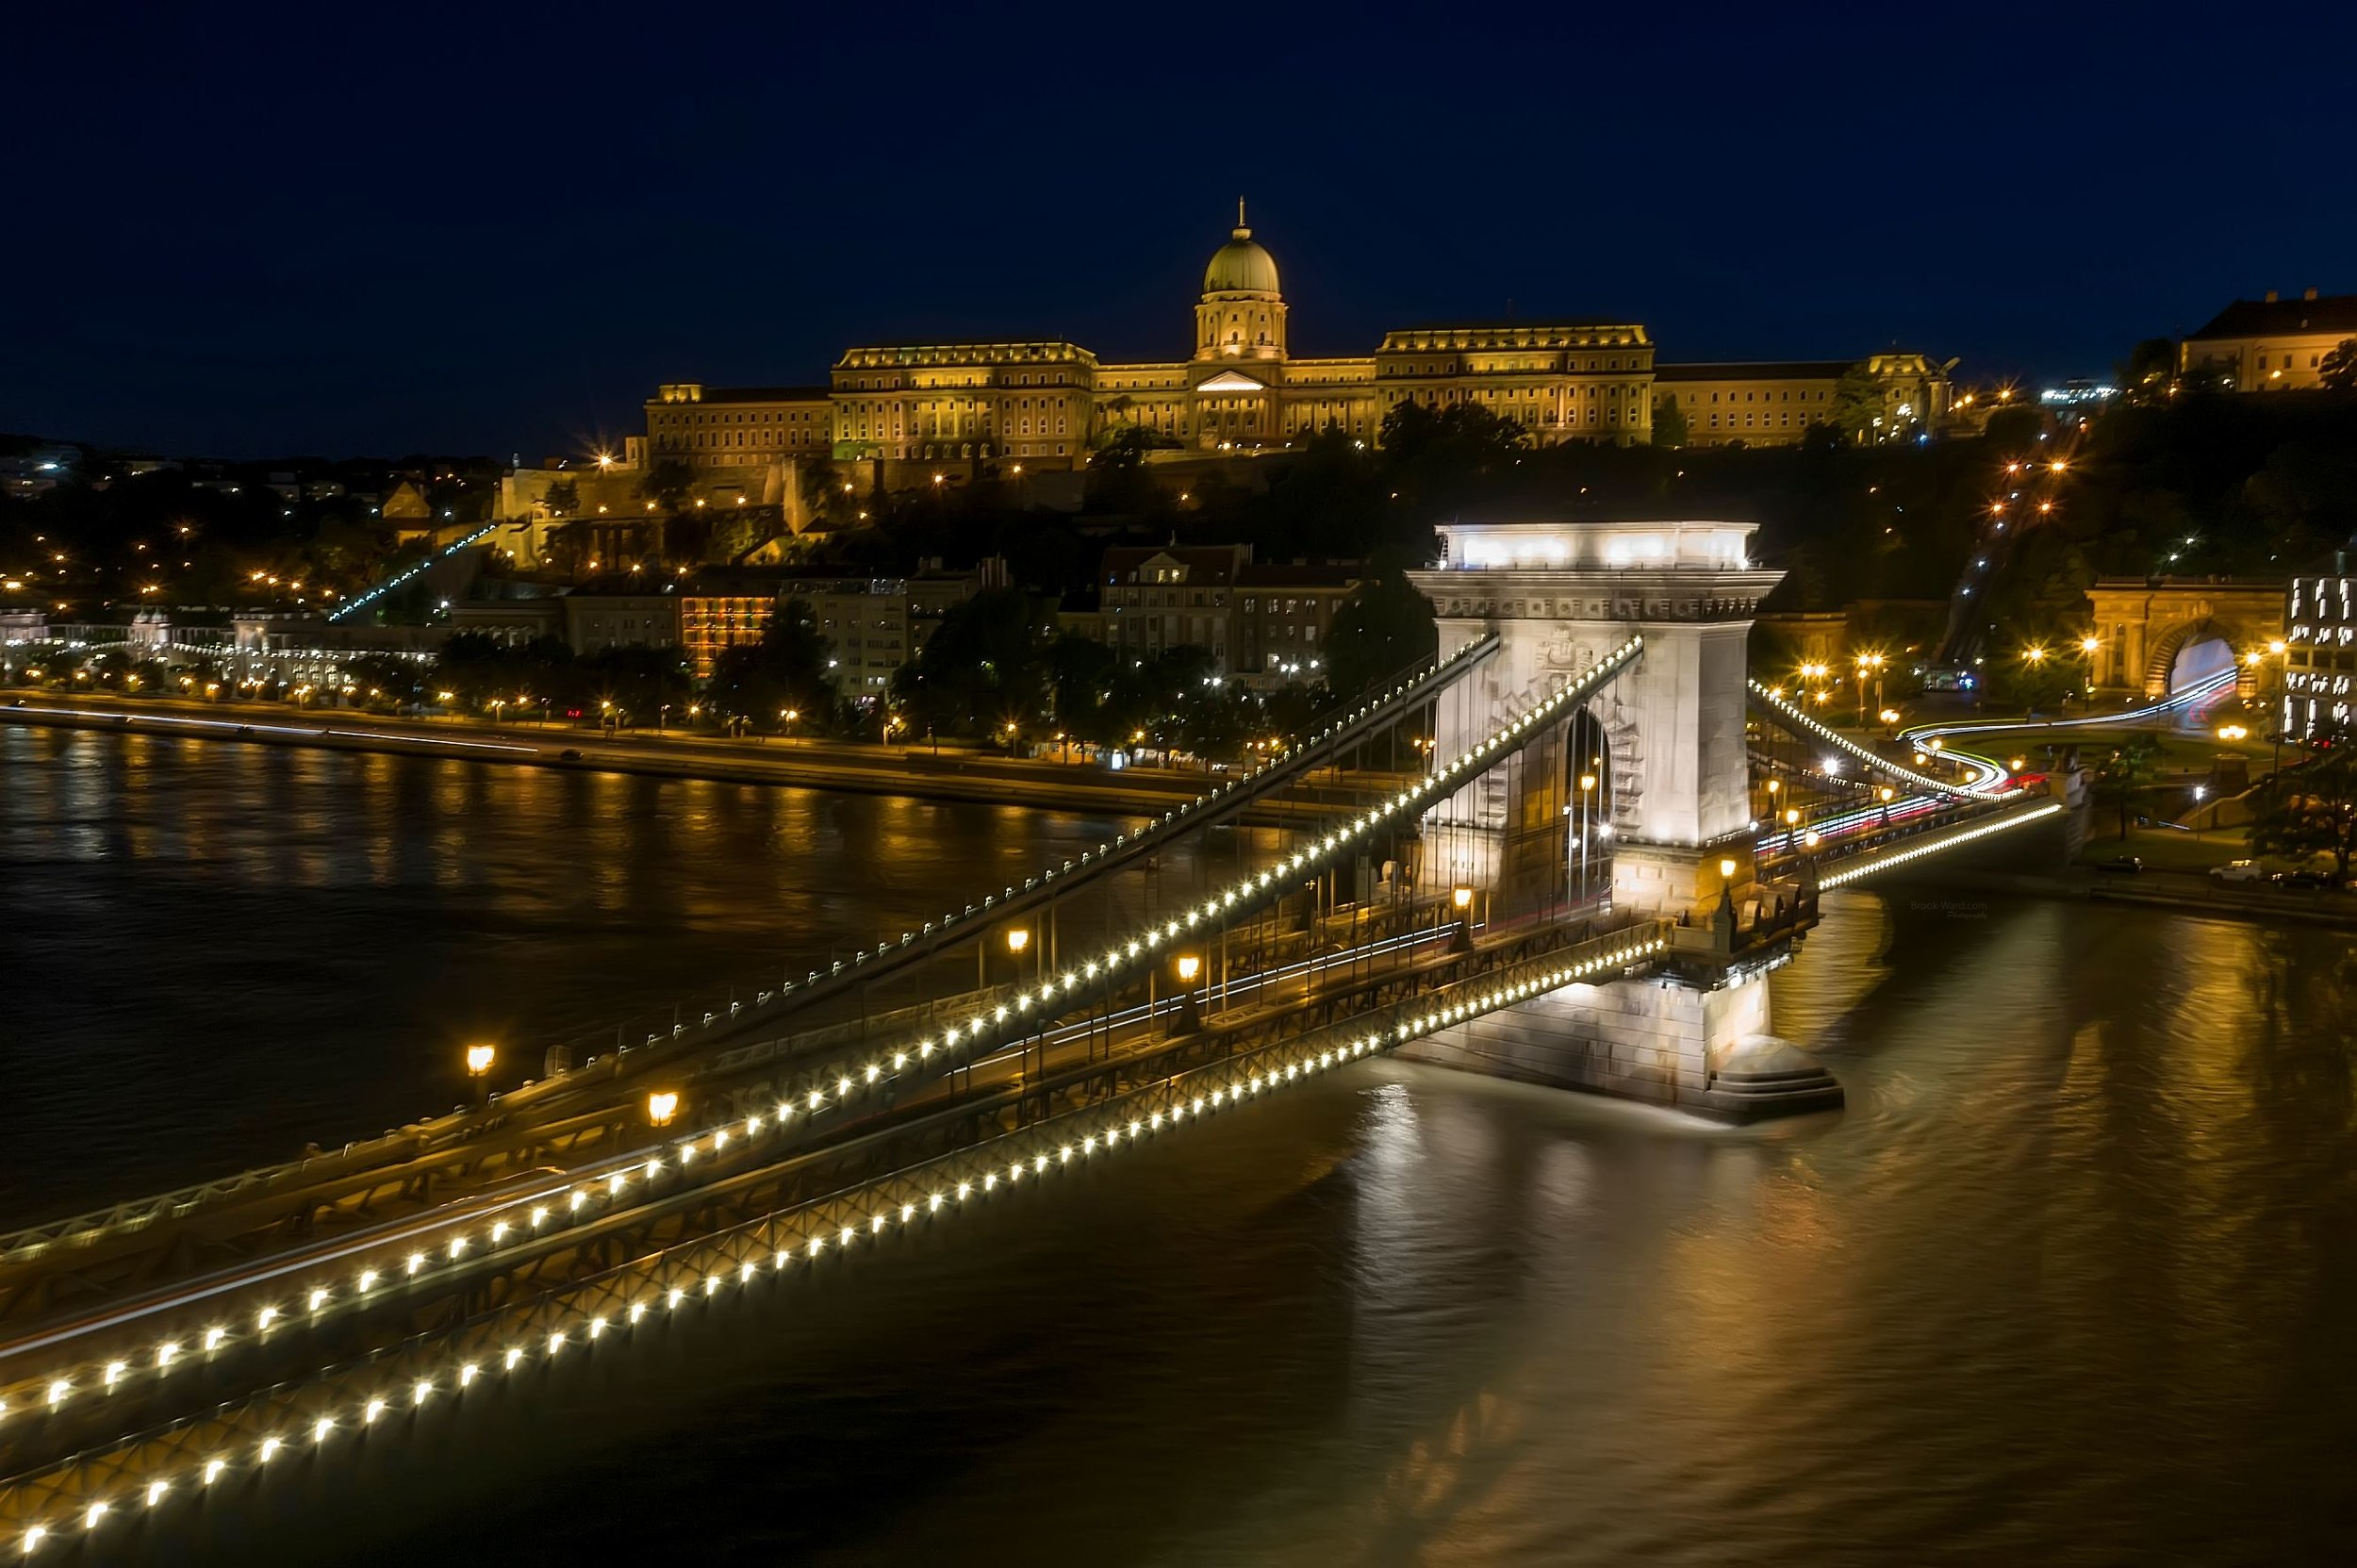 Budapest - Szechenyi Chain Bridge